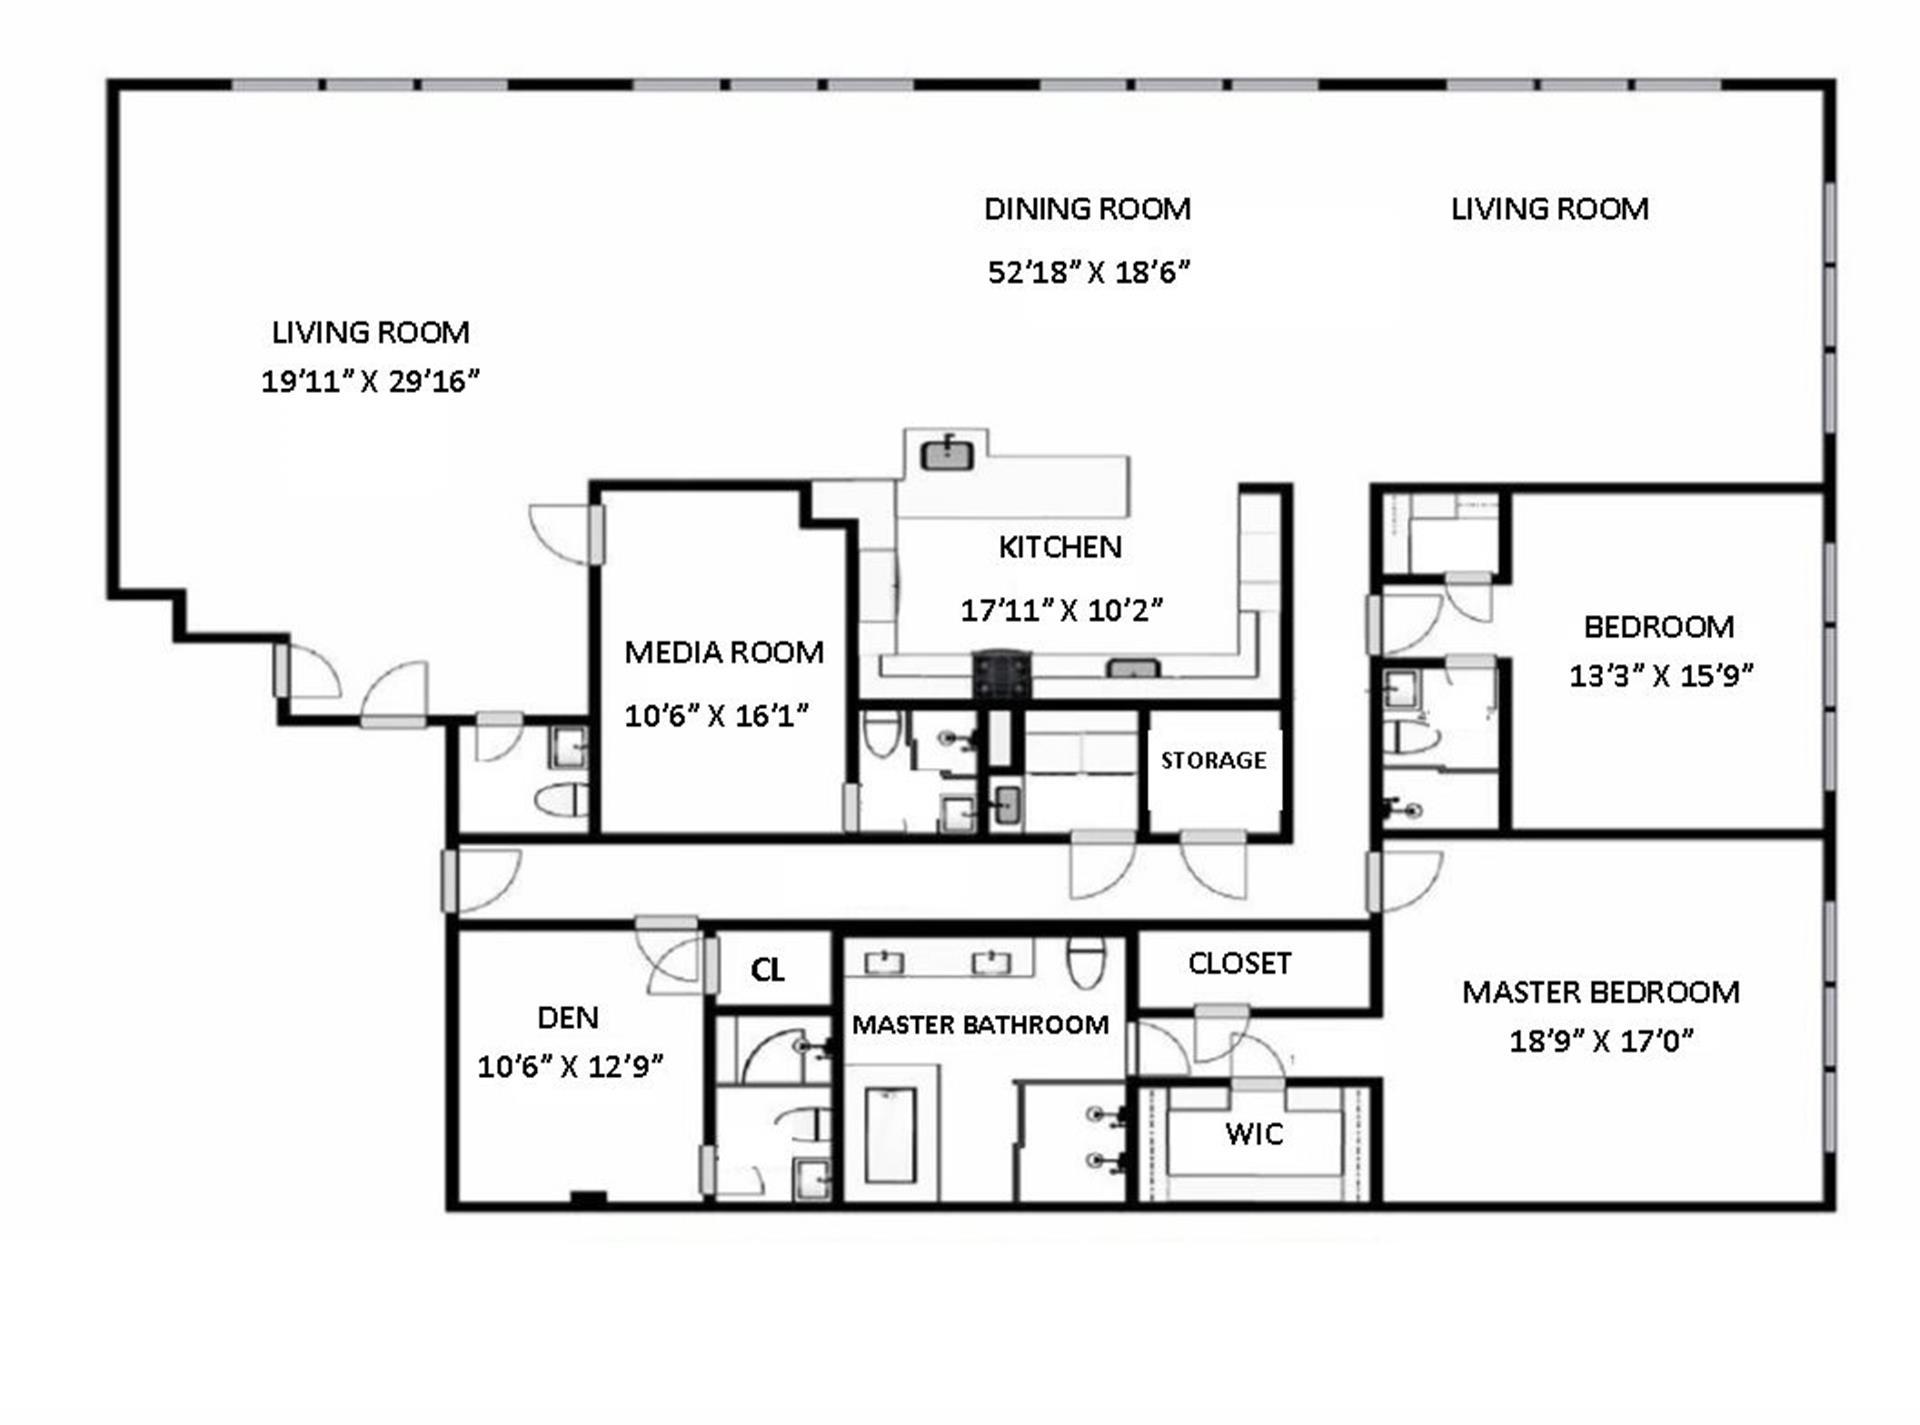 Floor plan of 145 Sixth Avenue, 5AB - SoHo - Nolita, New York